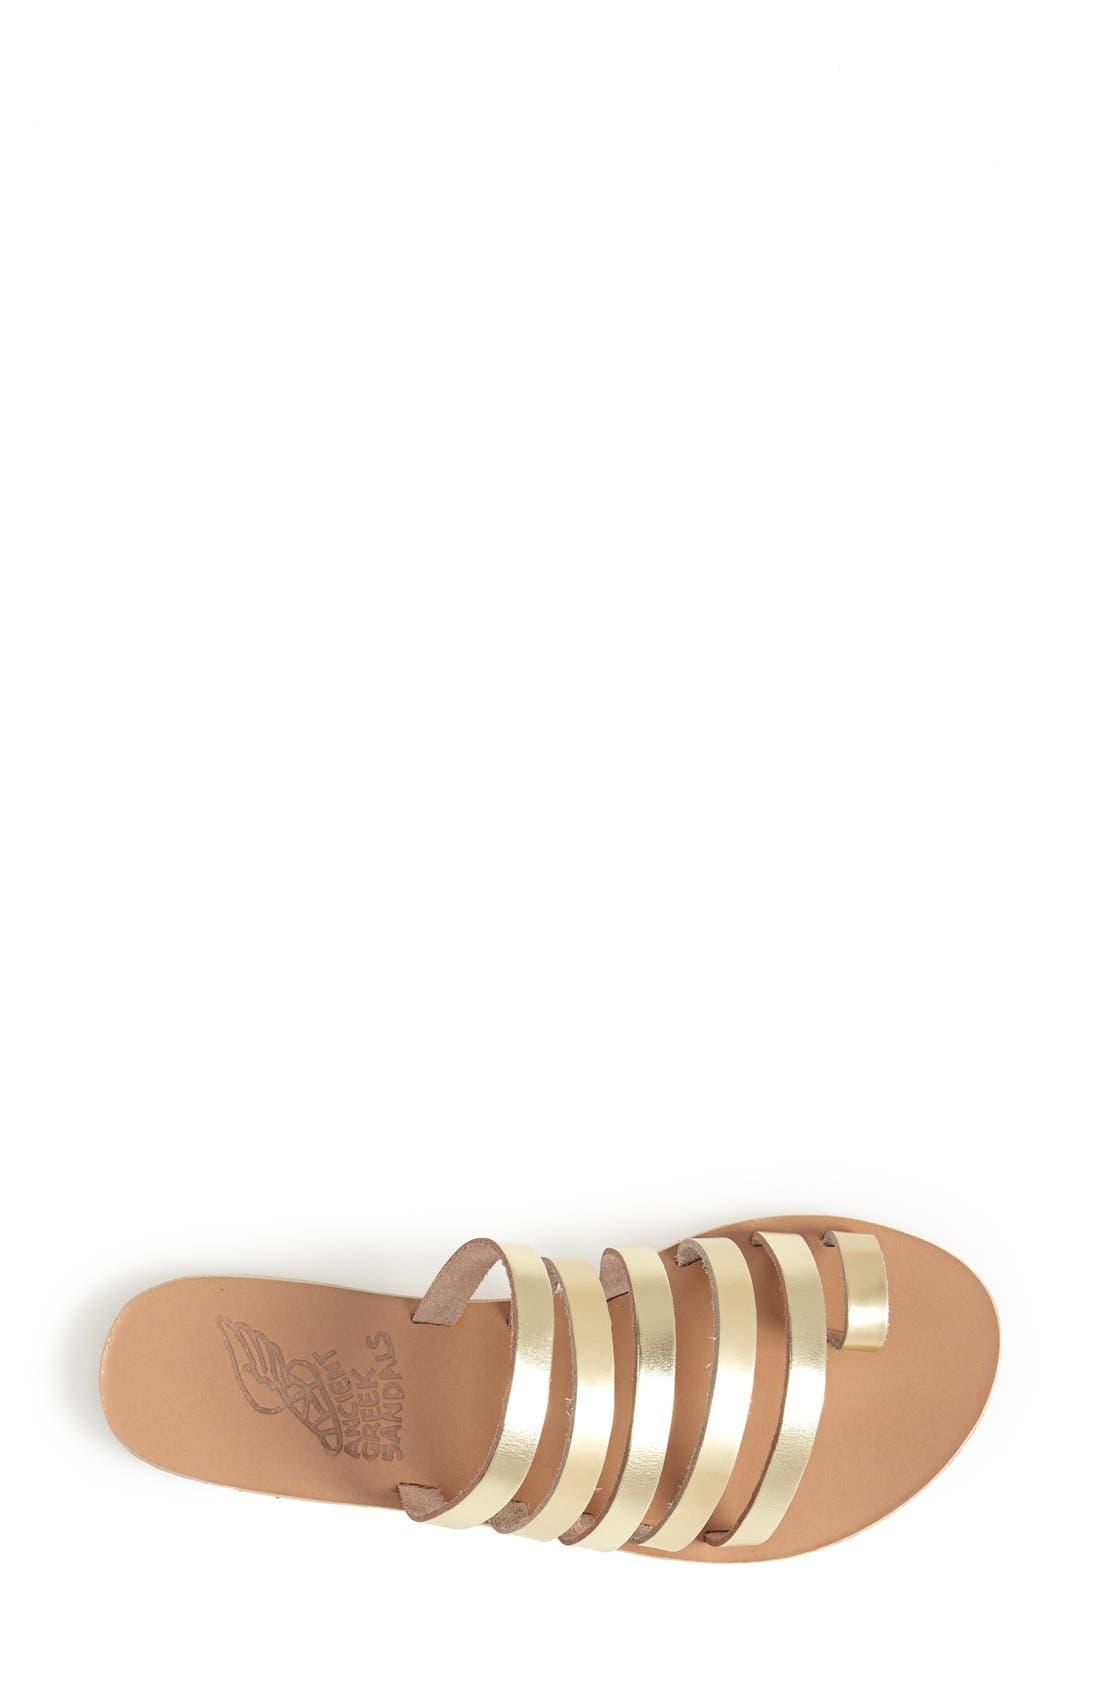 Alternate Image 3  - Ancient Greek Sandals 'Niki' Leather Sandal (Women)